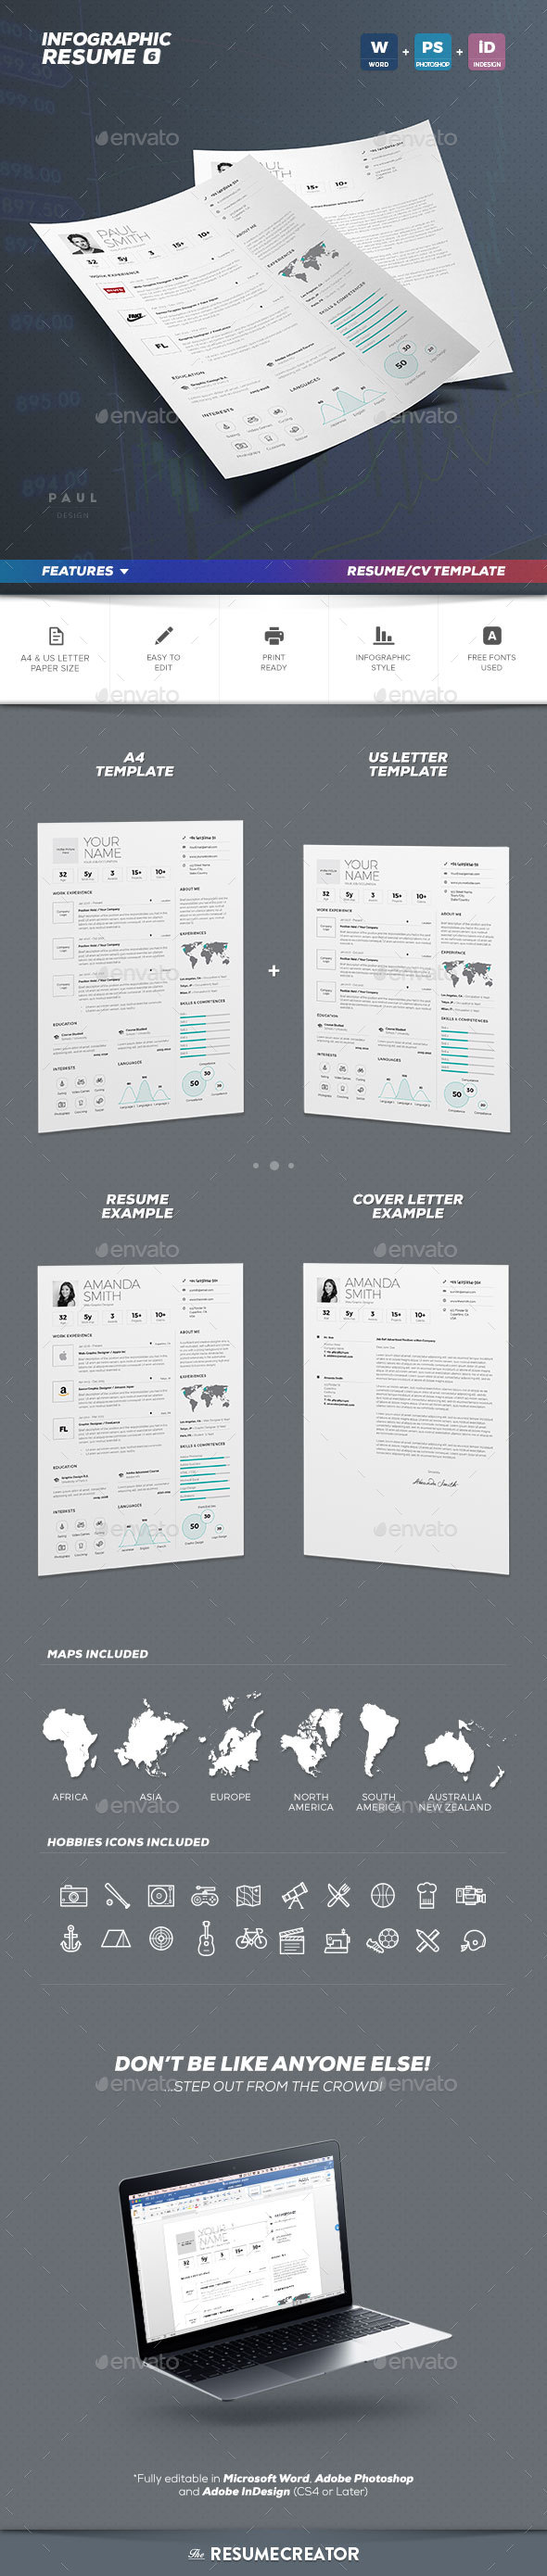 Infographic Resume Cv Volume 6